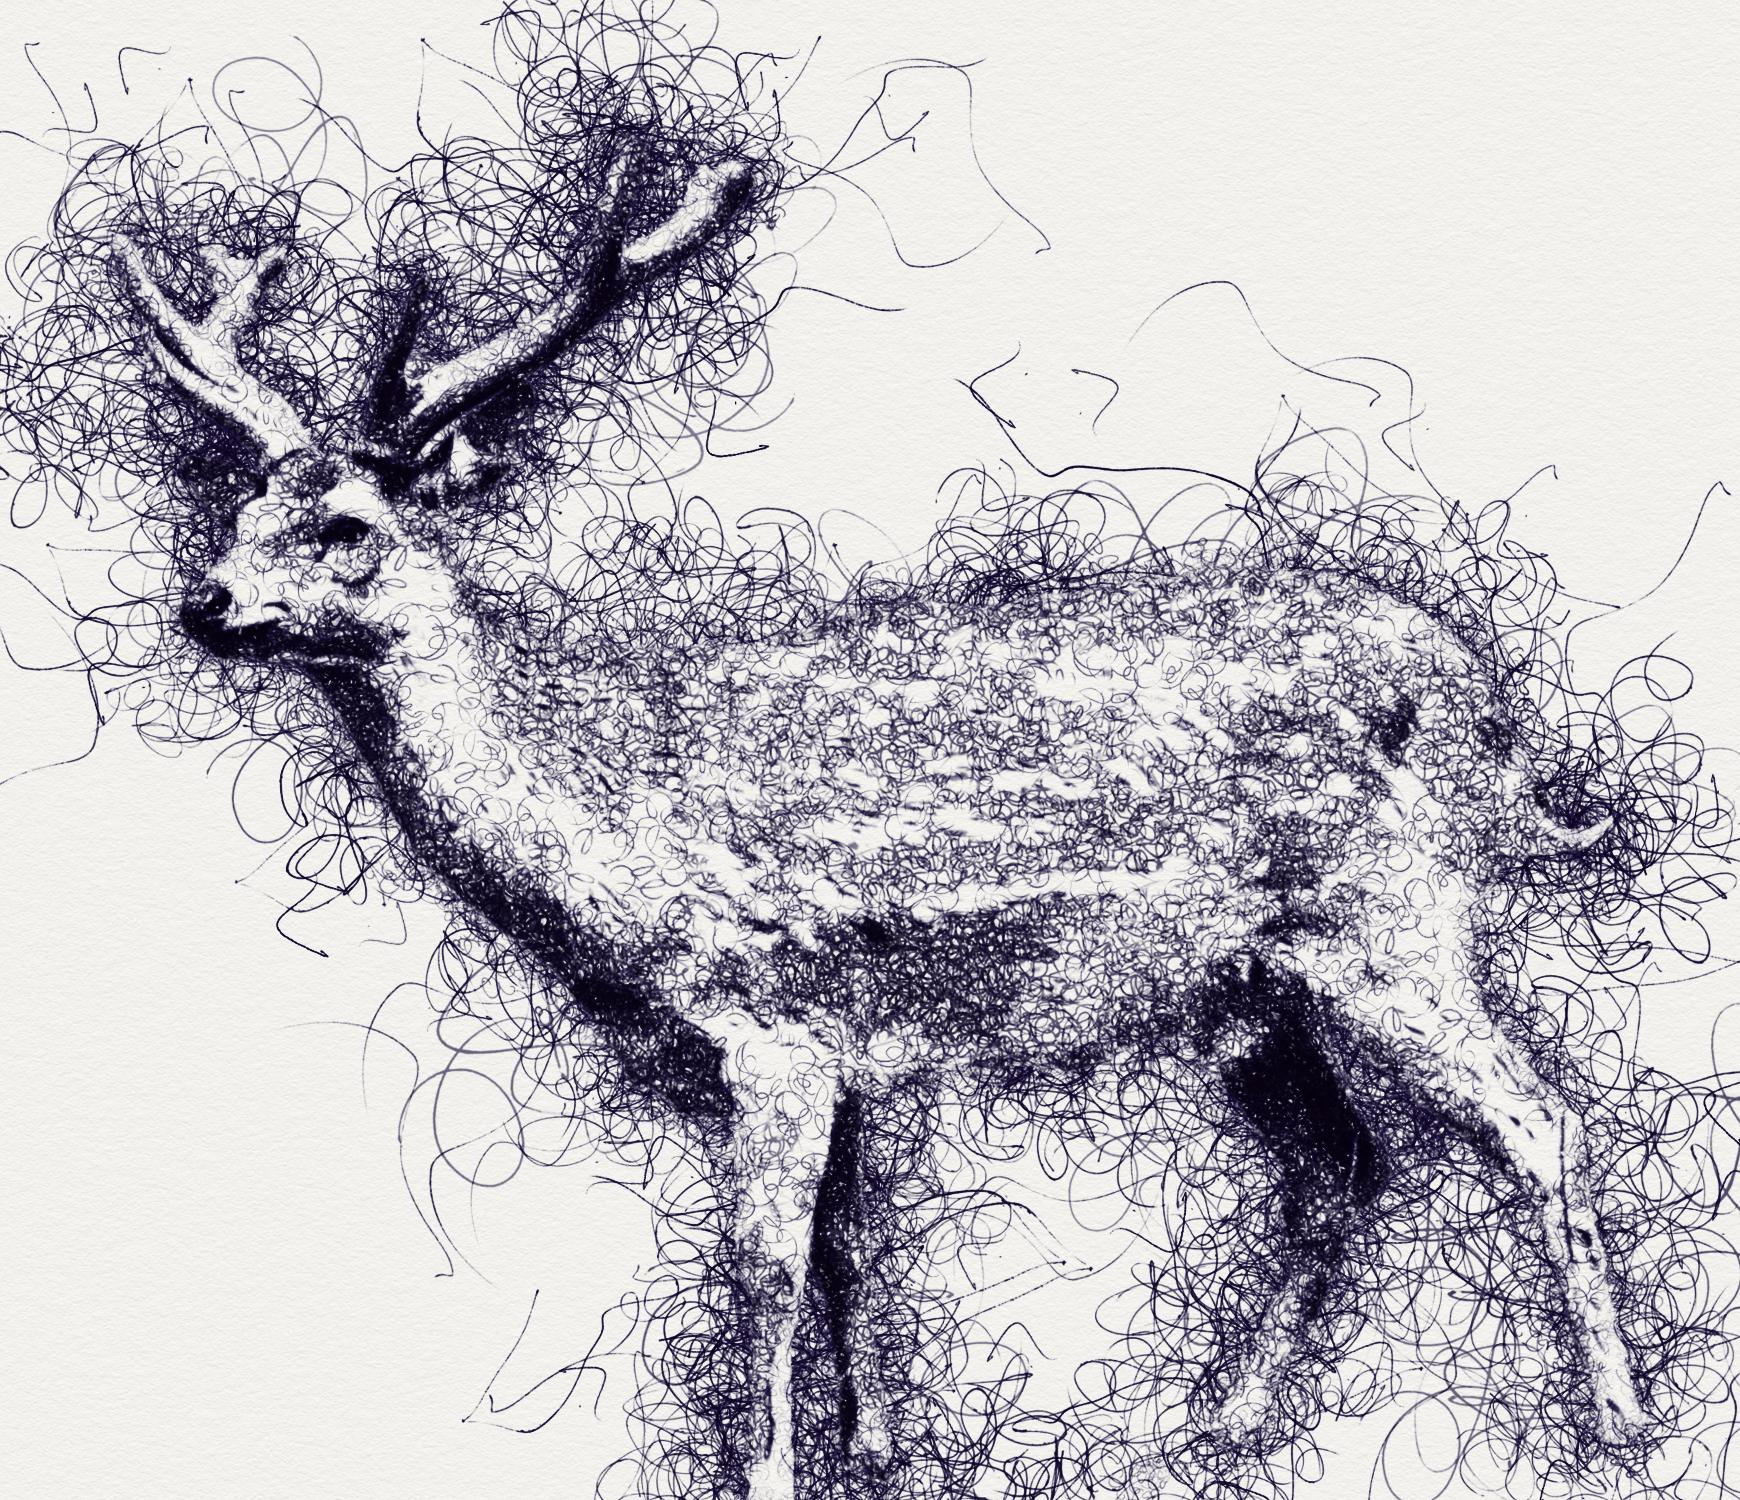 Scribble Pen Sketch Photoshop Action v2